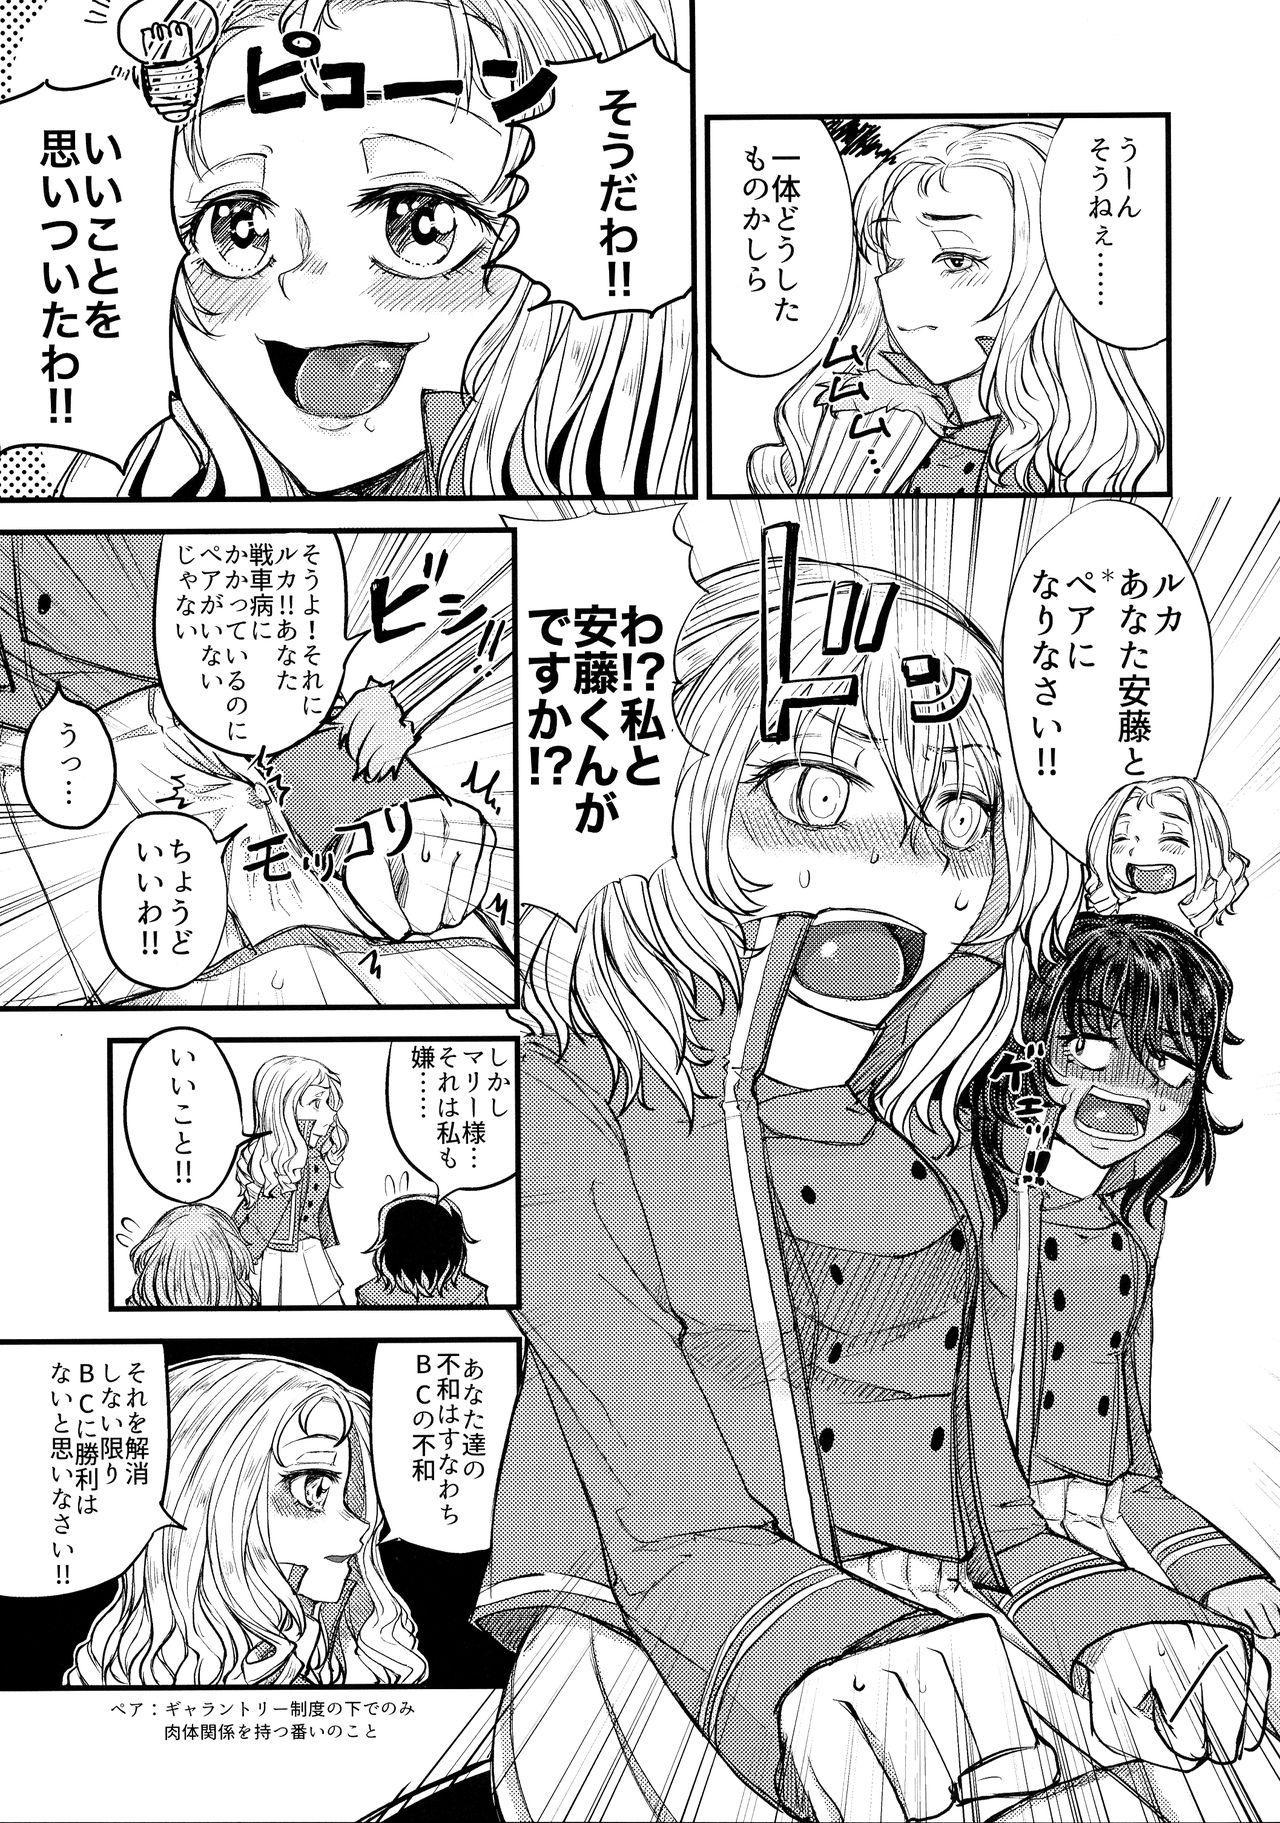 Kimi o Aishitai. 4